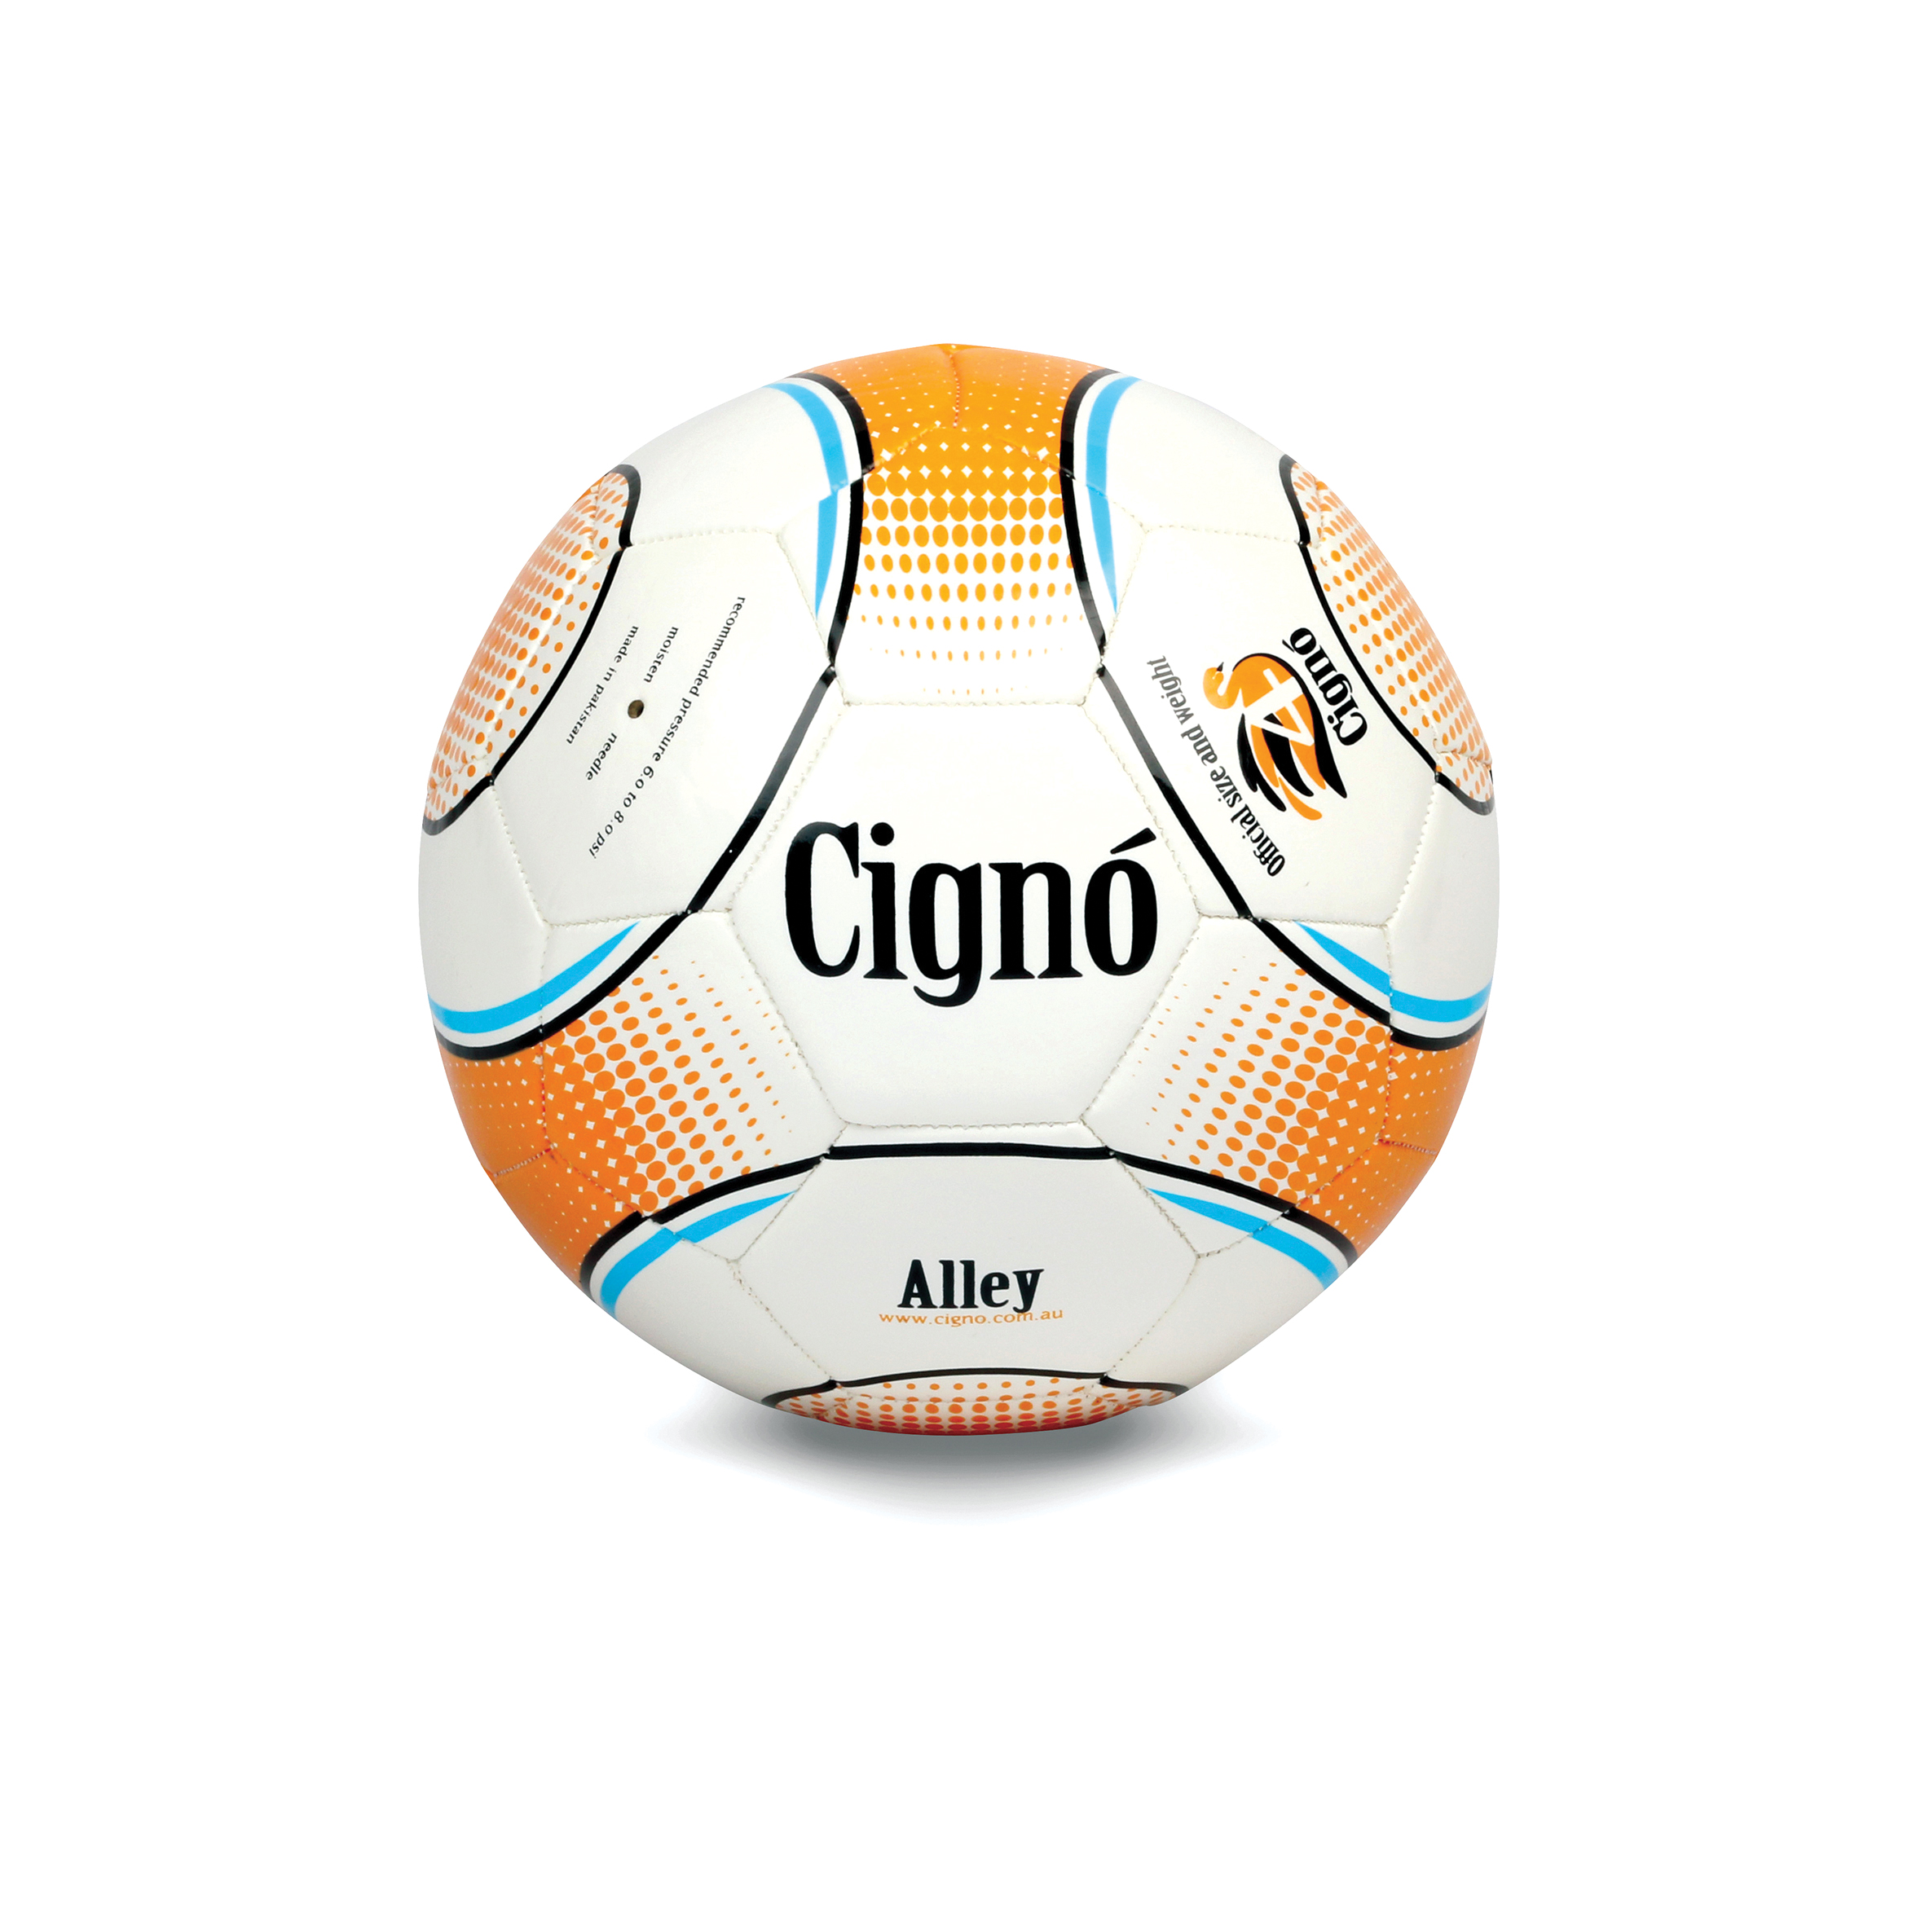 Cigno Alley Training Football